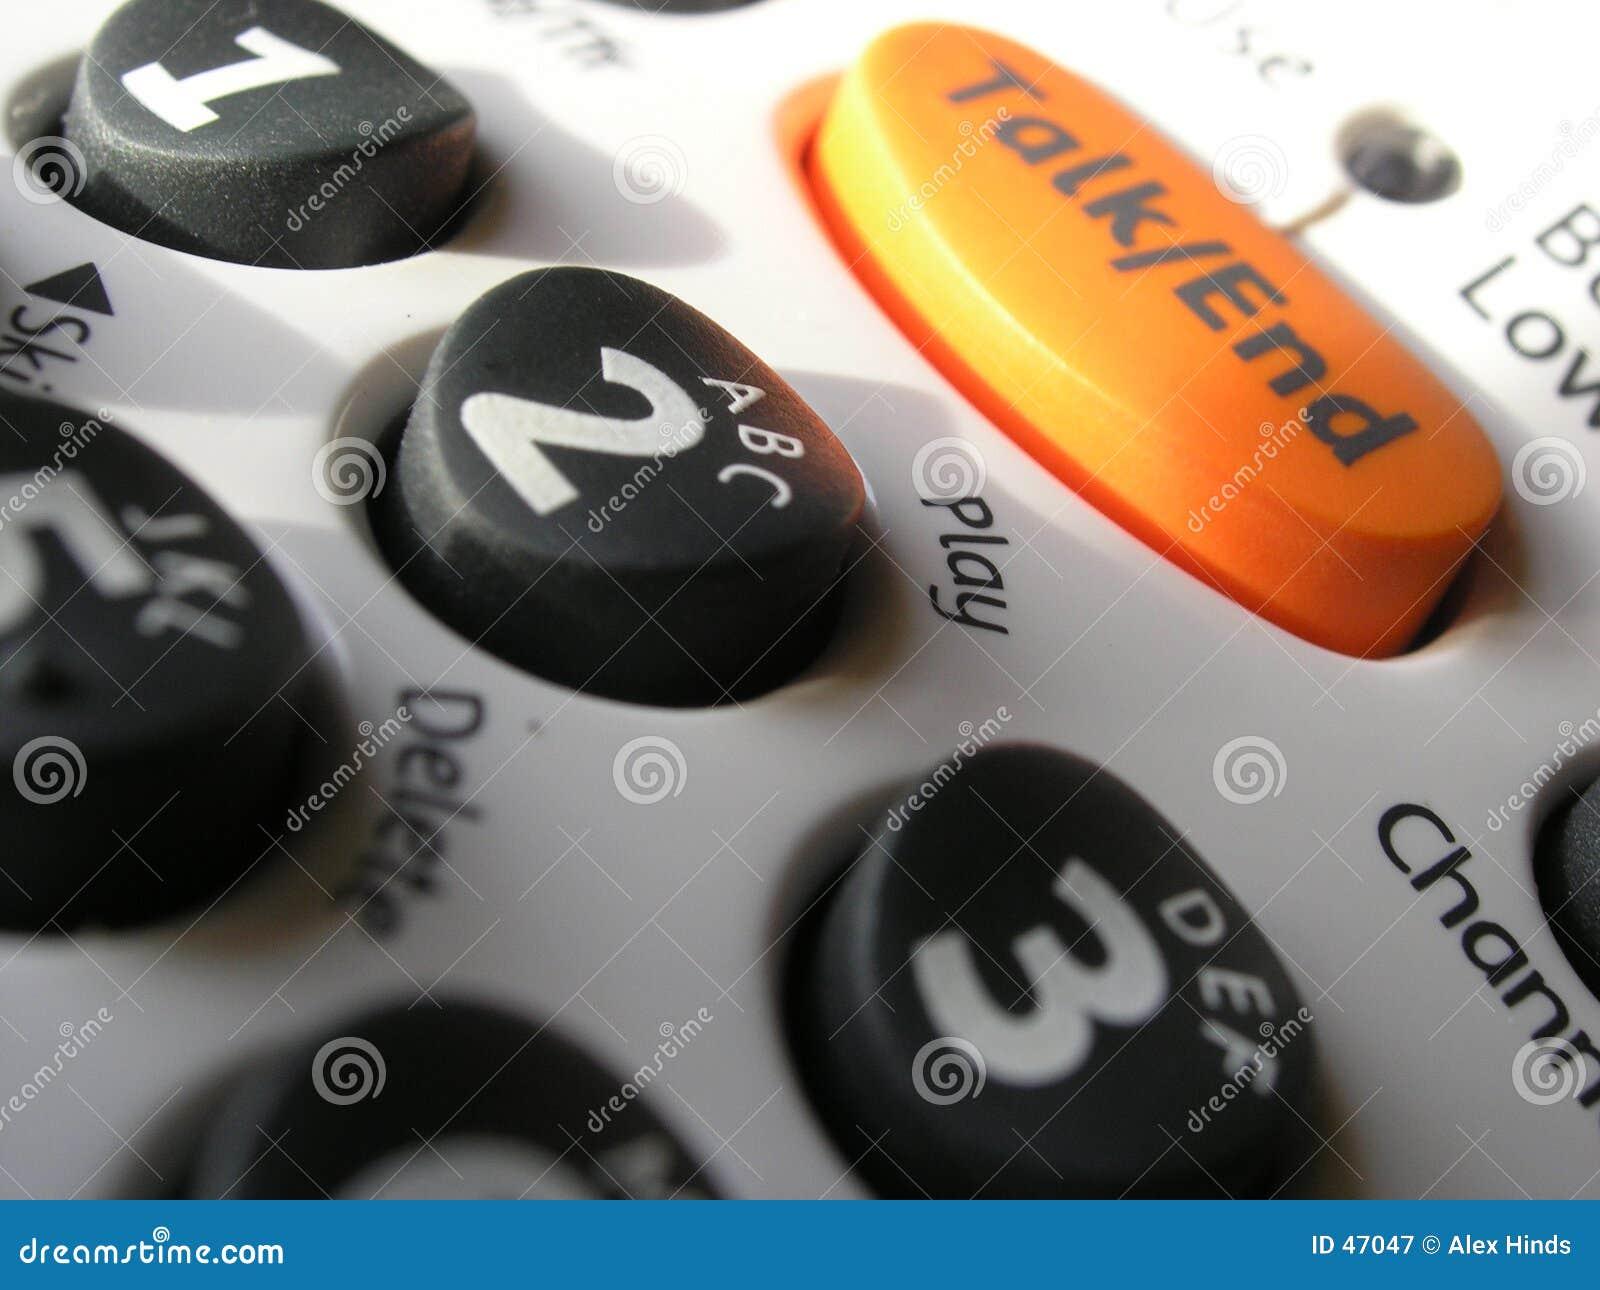 Telefonschlüsselauflage